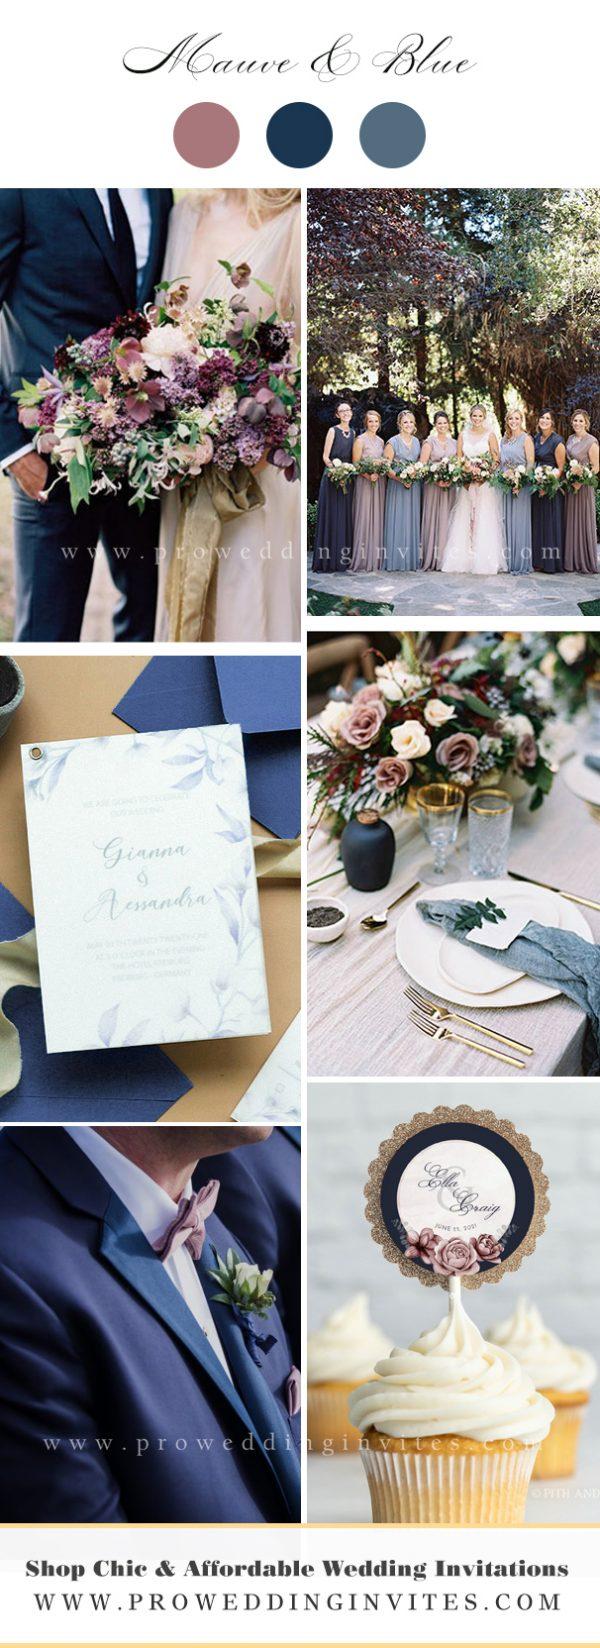 Mauve & Navy rustic wedding ideasn Wedding Ideas Wedding Wedding Color Ideas with Matching Invitations